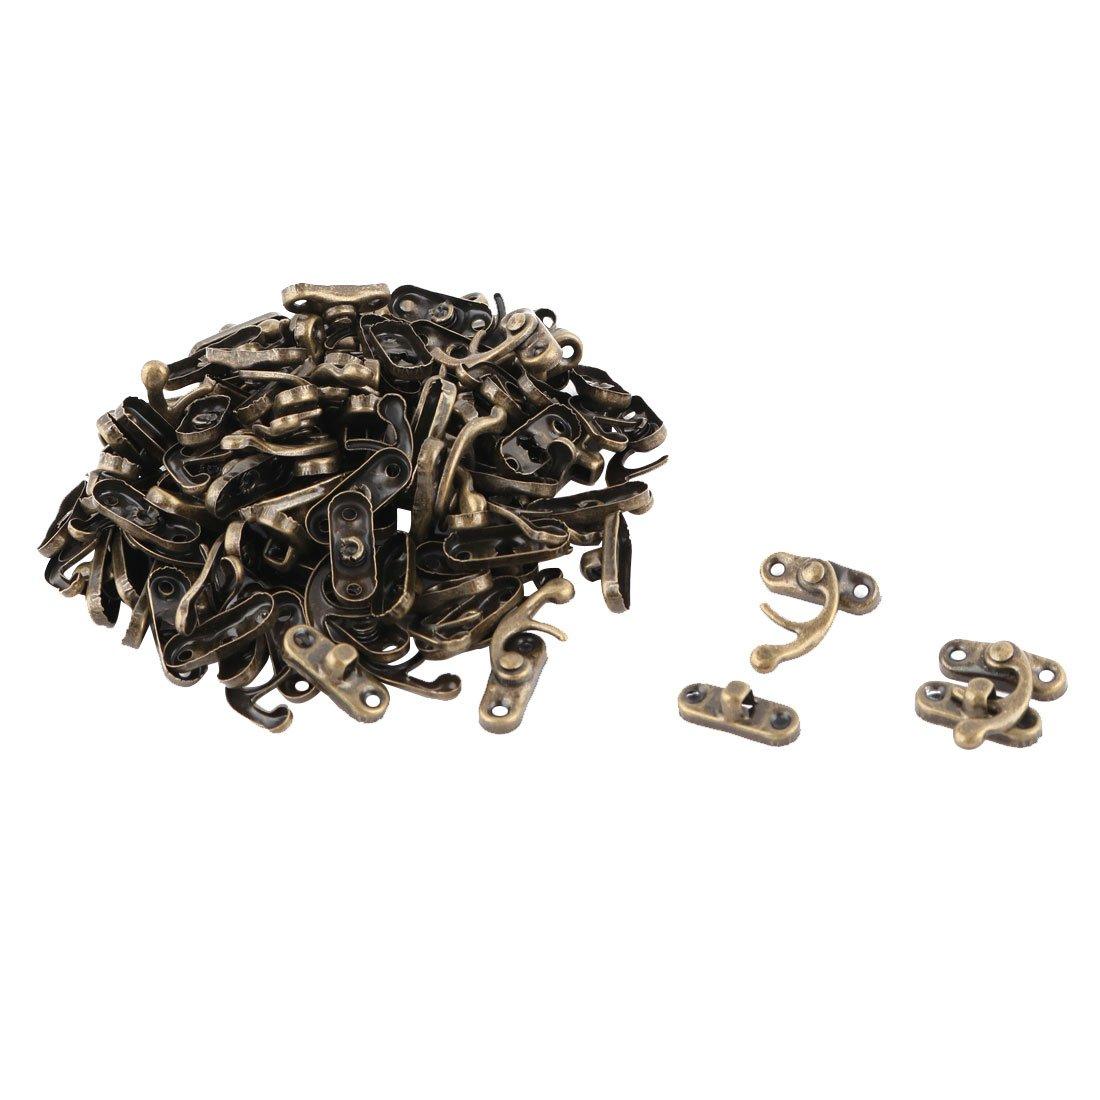 uxcell Metal Family Jewelry Box Case Bag Closure Hasp Lock Latch Buckle Clasp 50pcs Bronze Tone